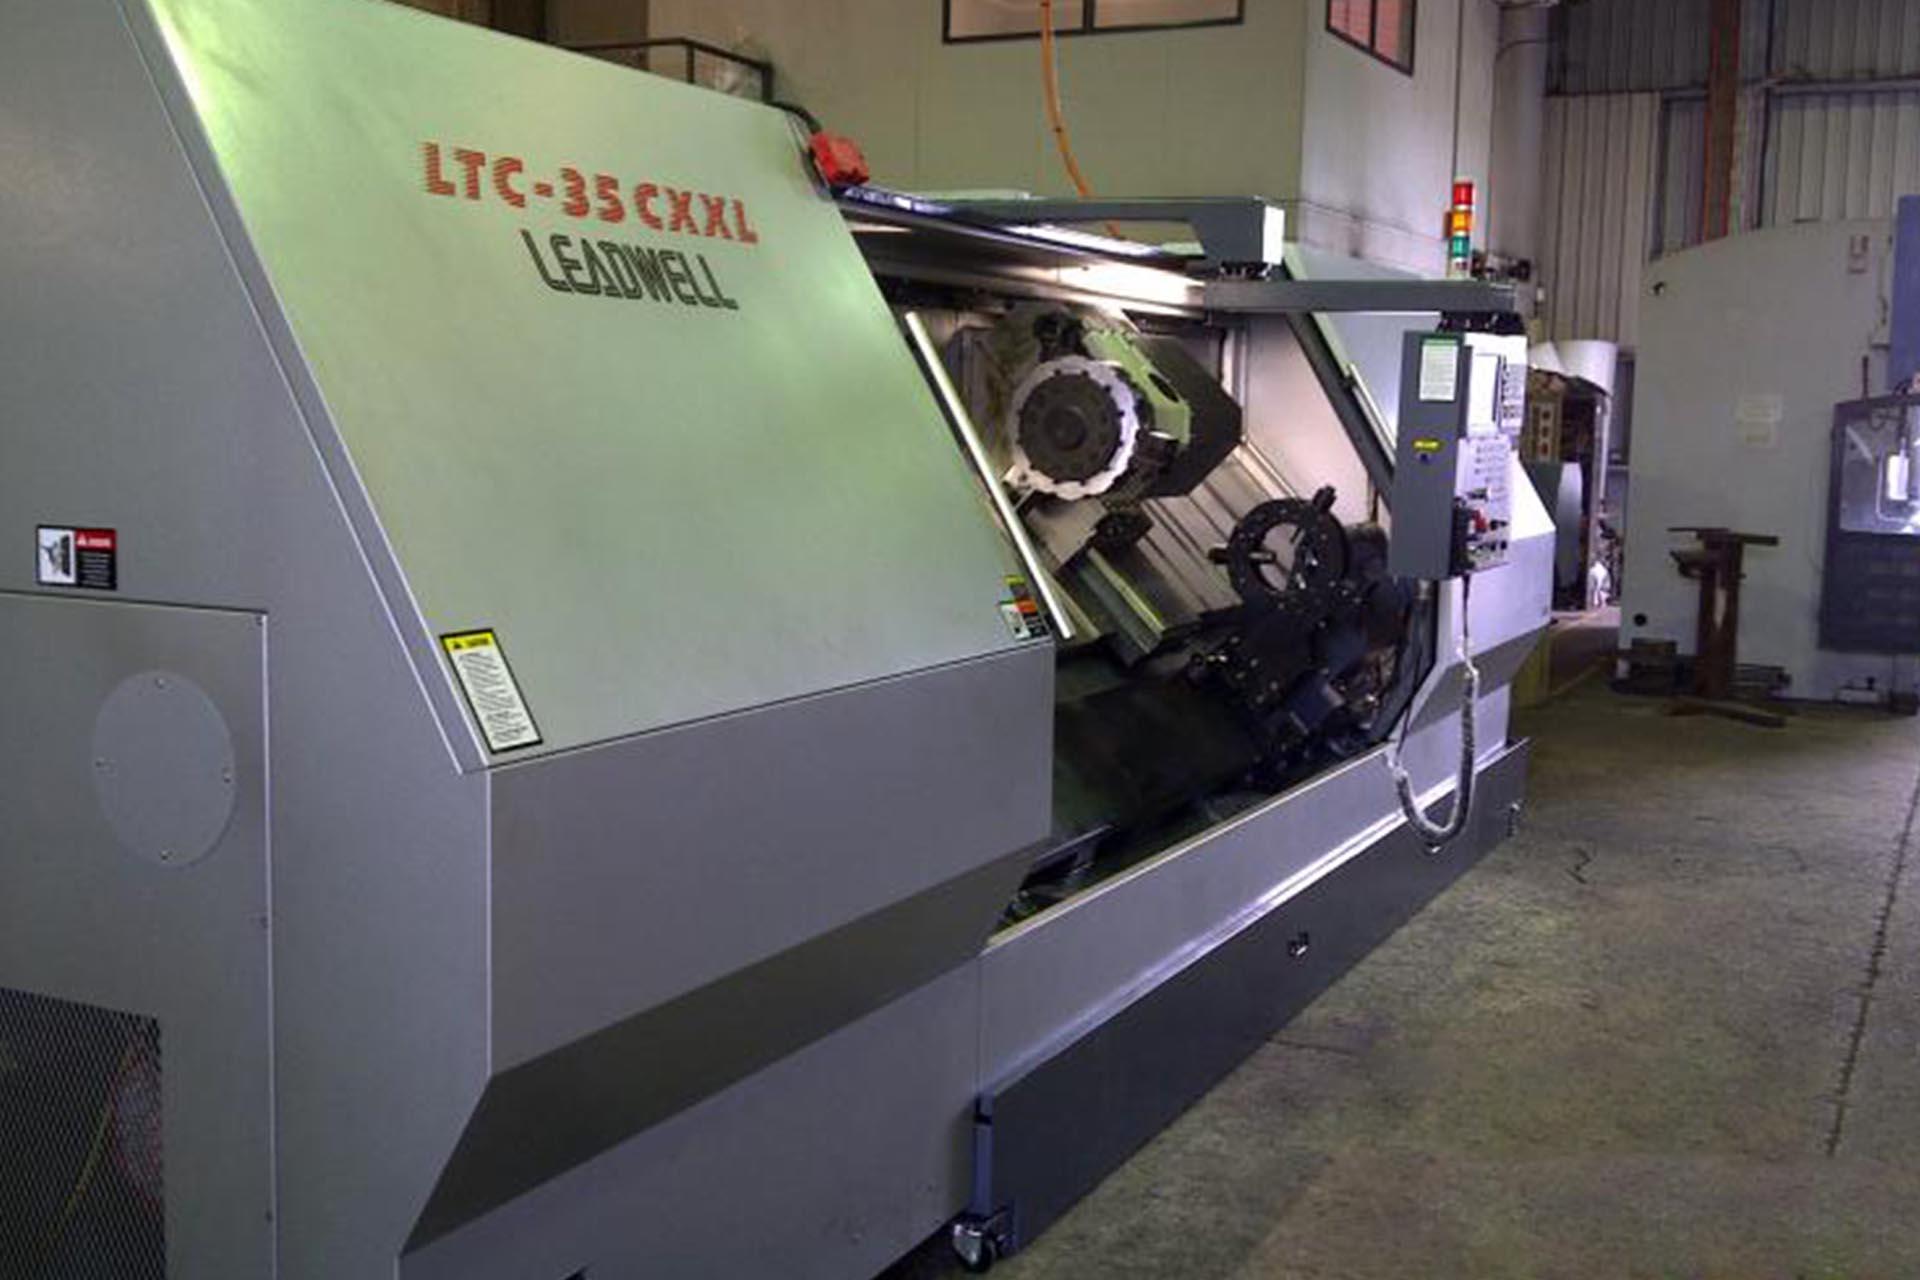 Large Leadwell CNC lathe